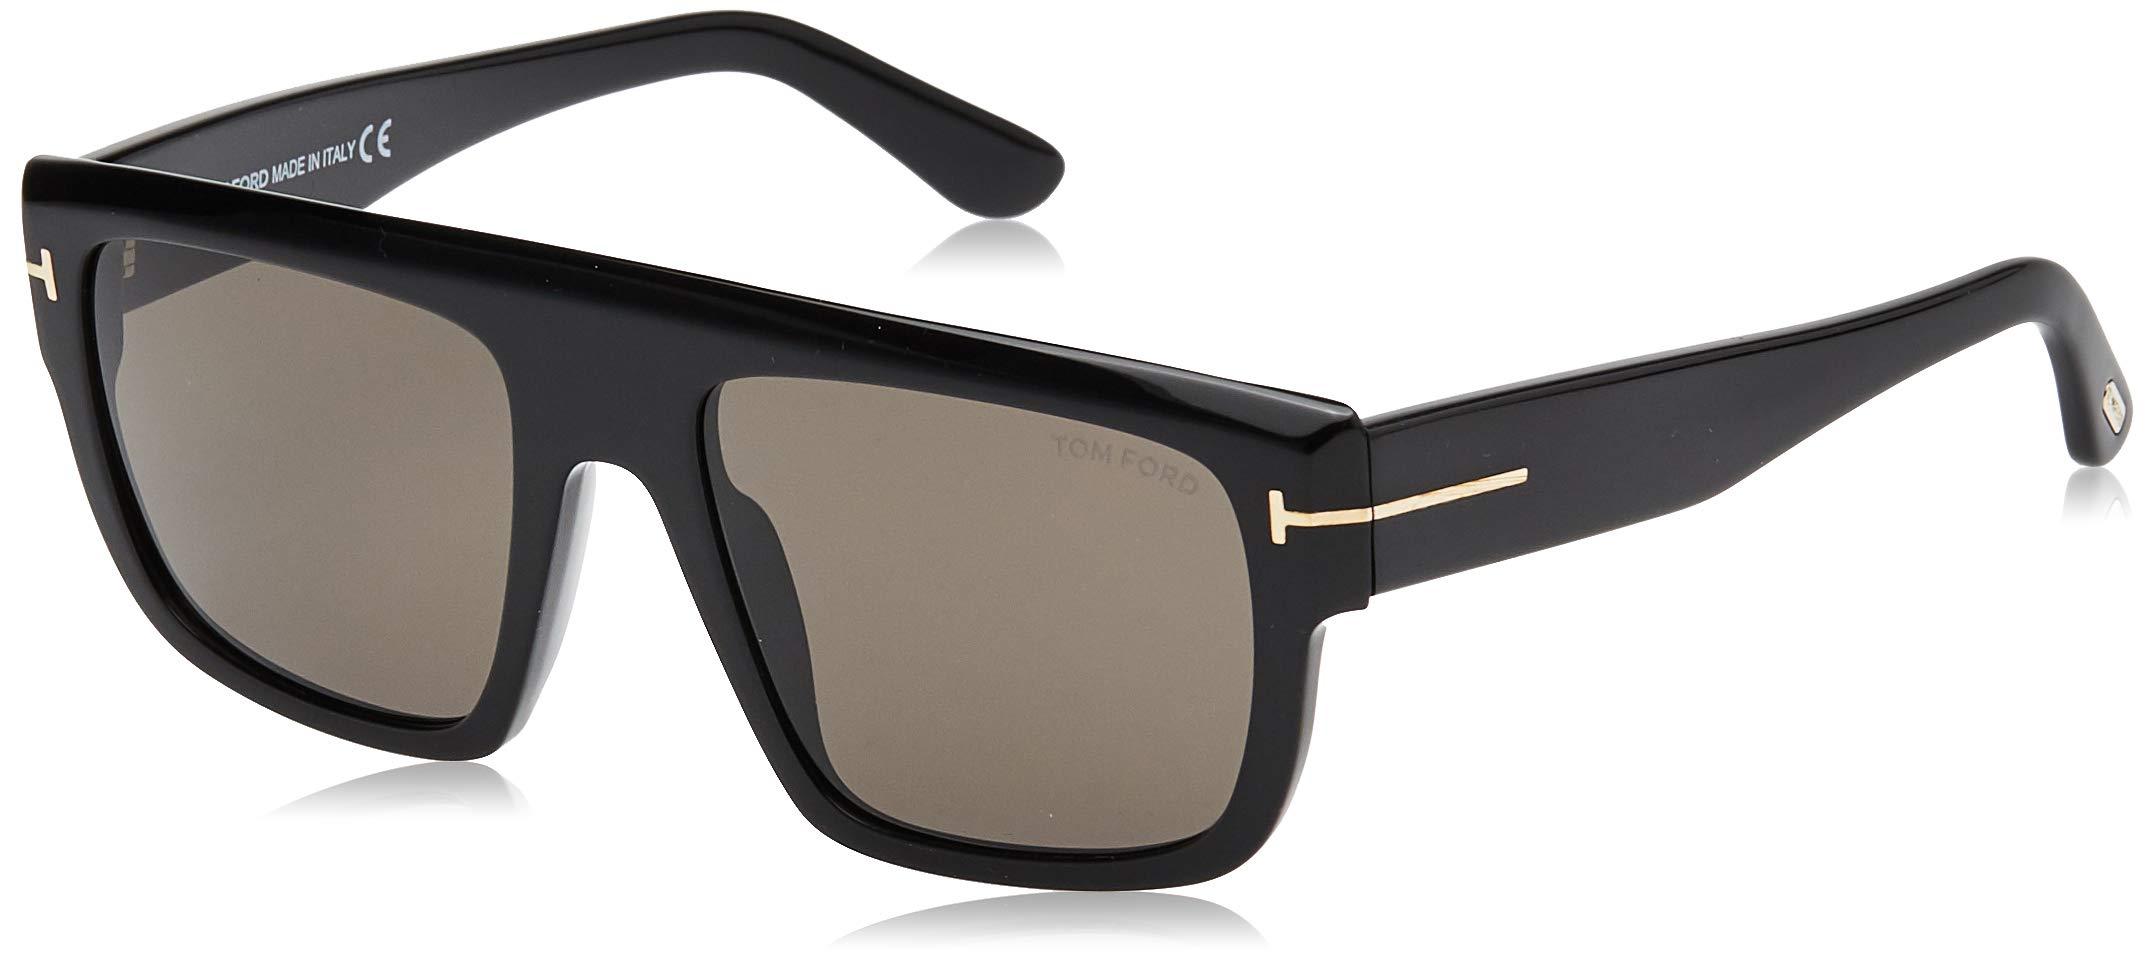 Tom Ford sunglasses Alessio (TF-699 01A) Shiny Black - Grey lenses